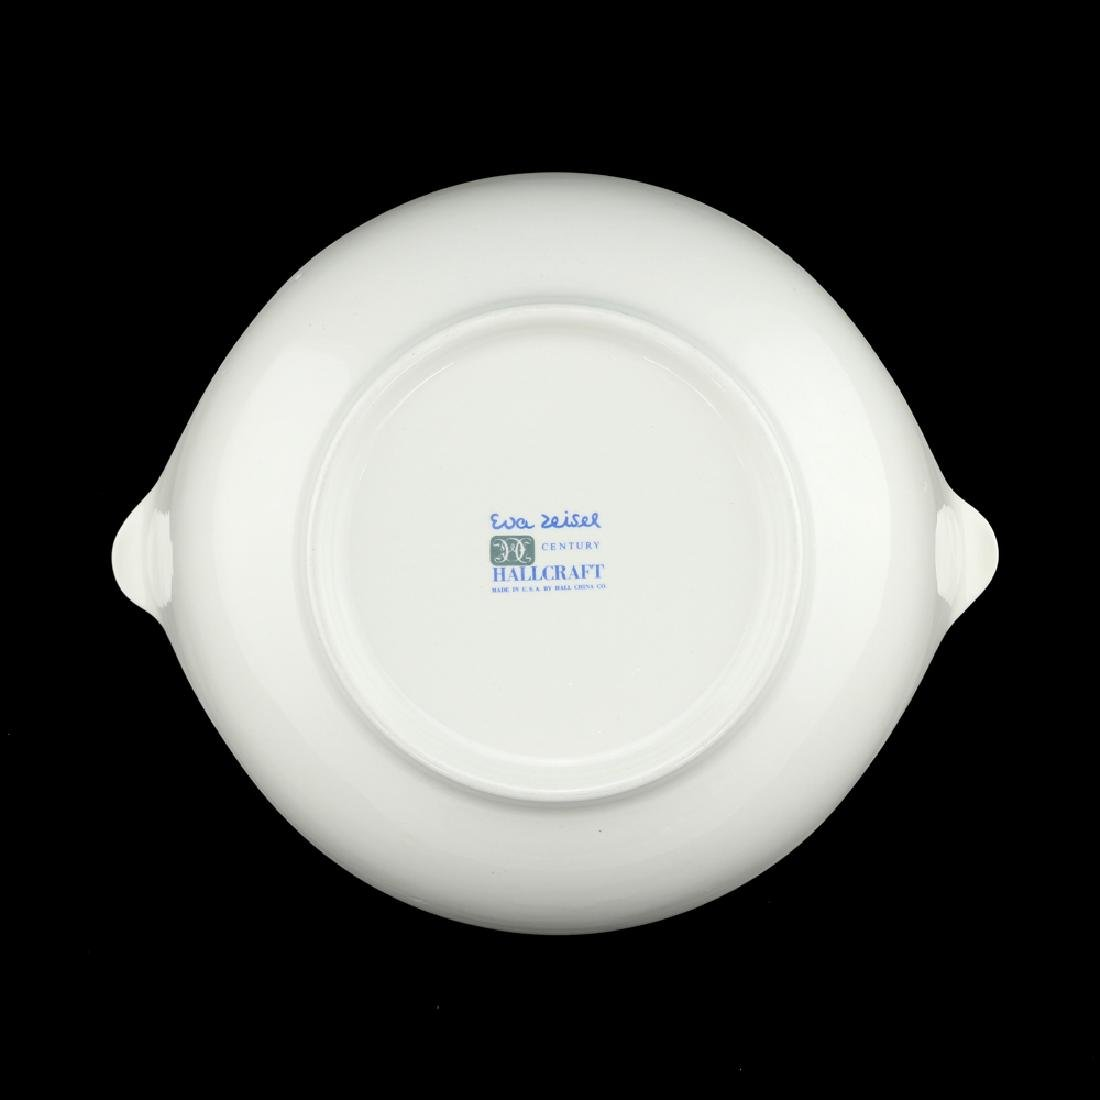 Zeisel Hallcraft Century Nesting Serving Bowls - 9